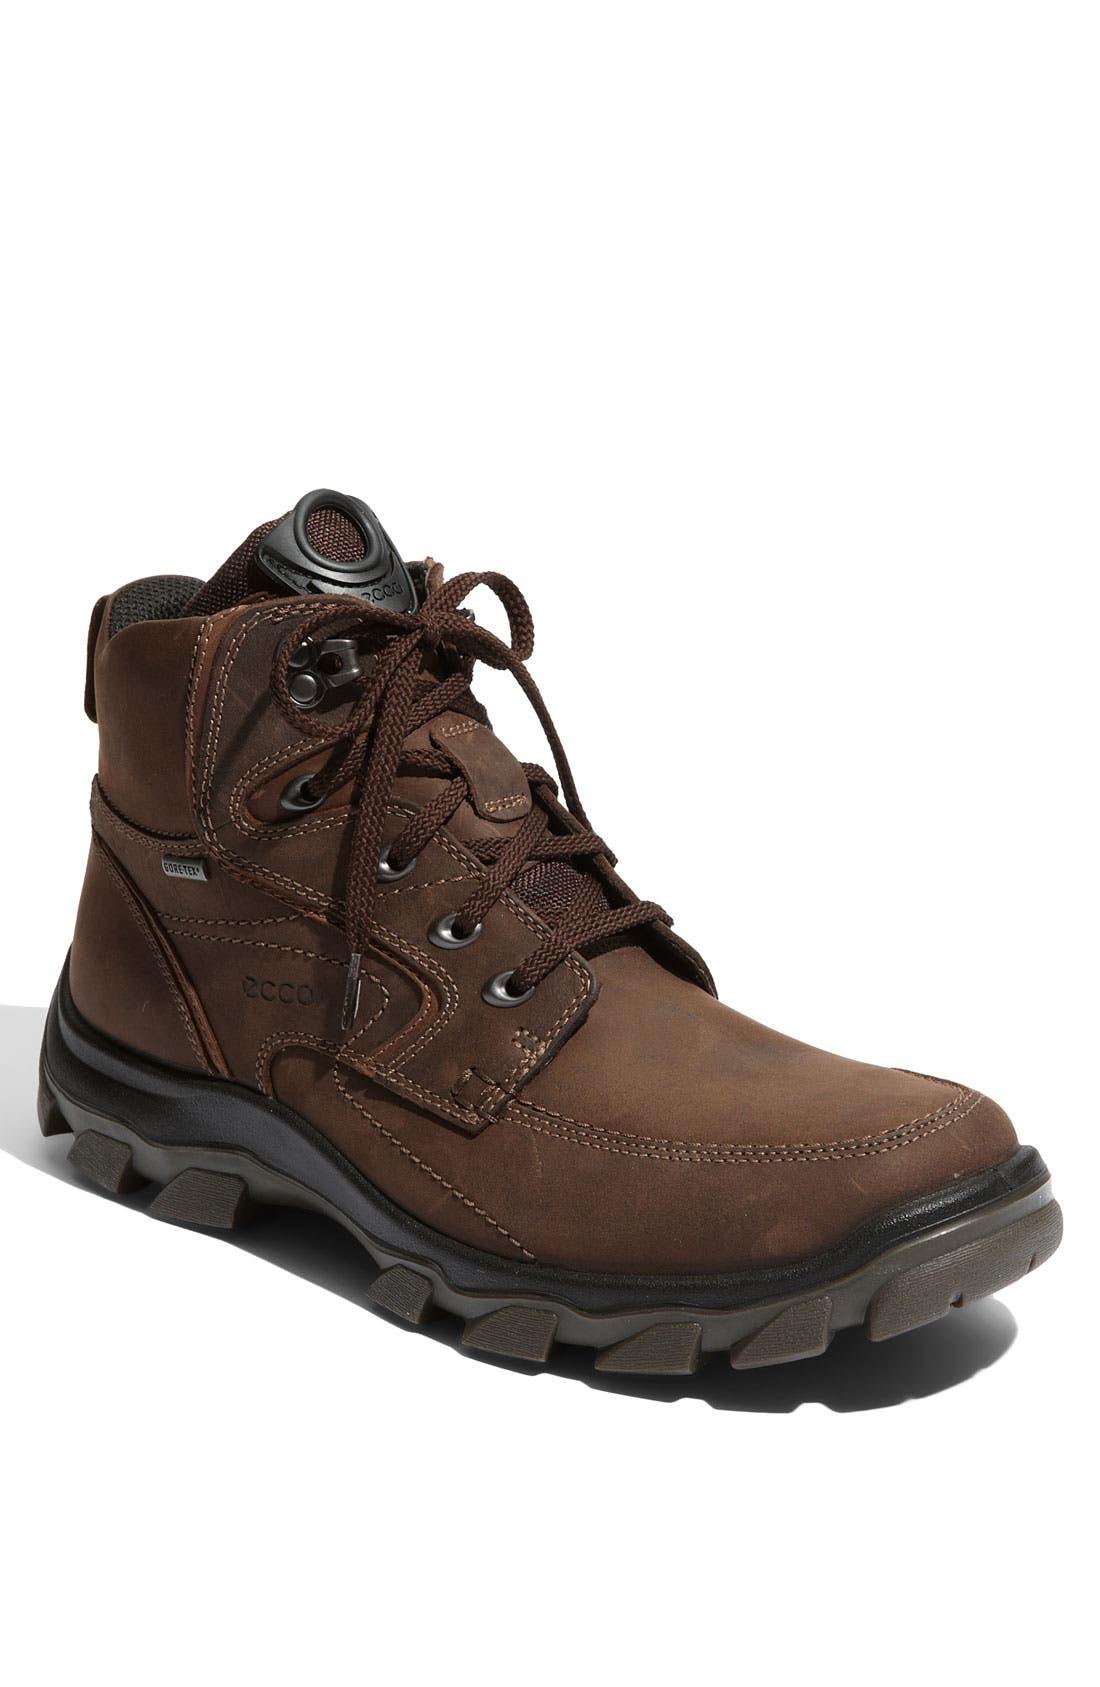 Main Image - ECCO 'Track 5' Waterproof Moc Toe Boot